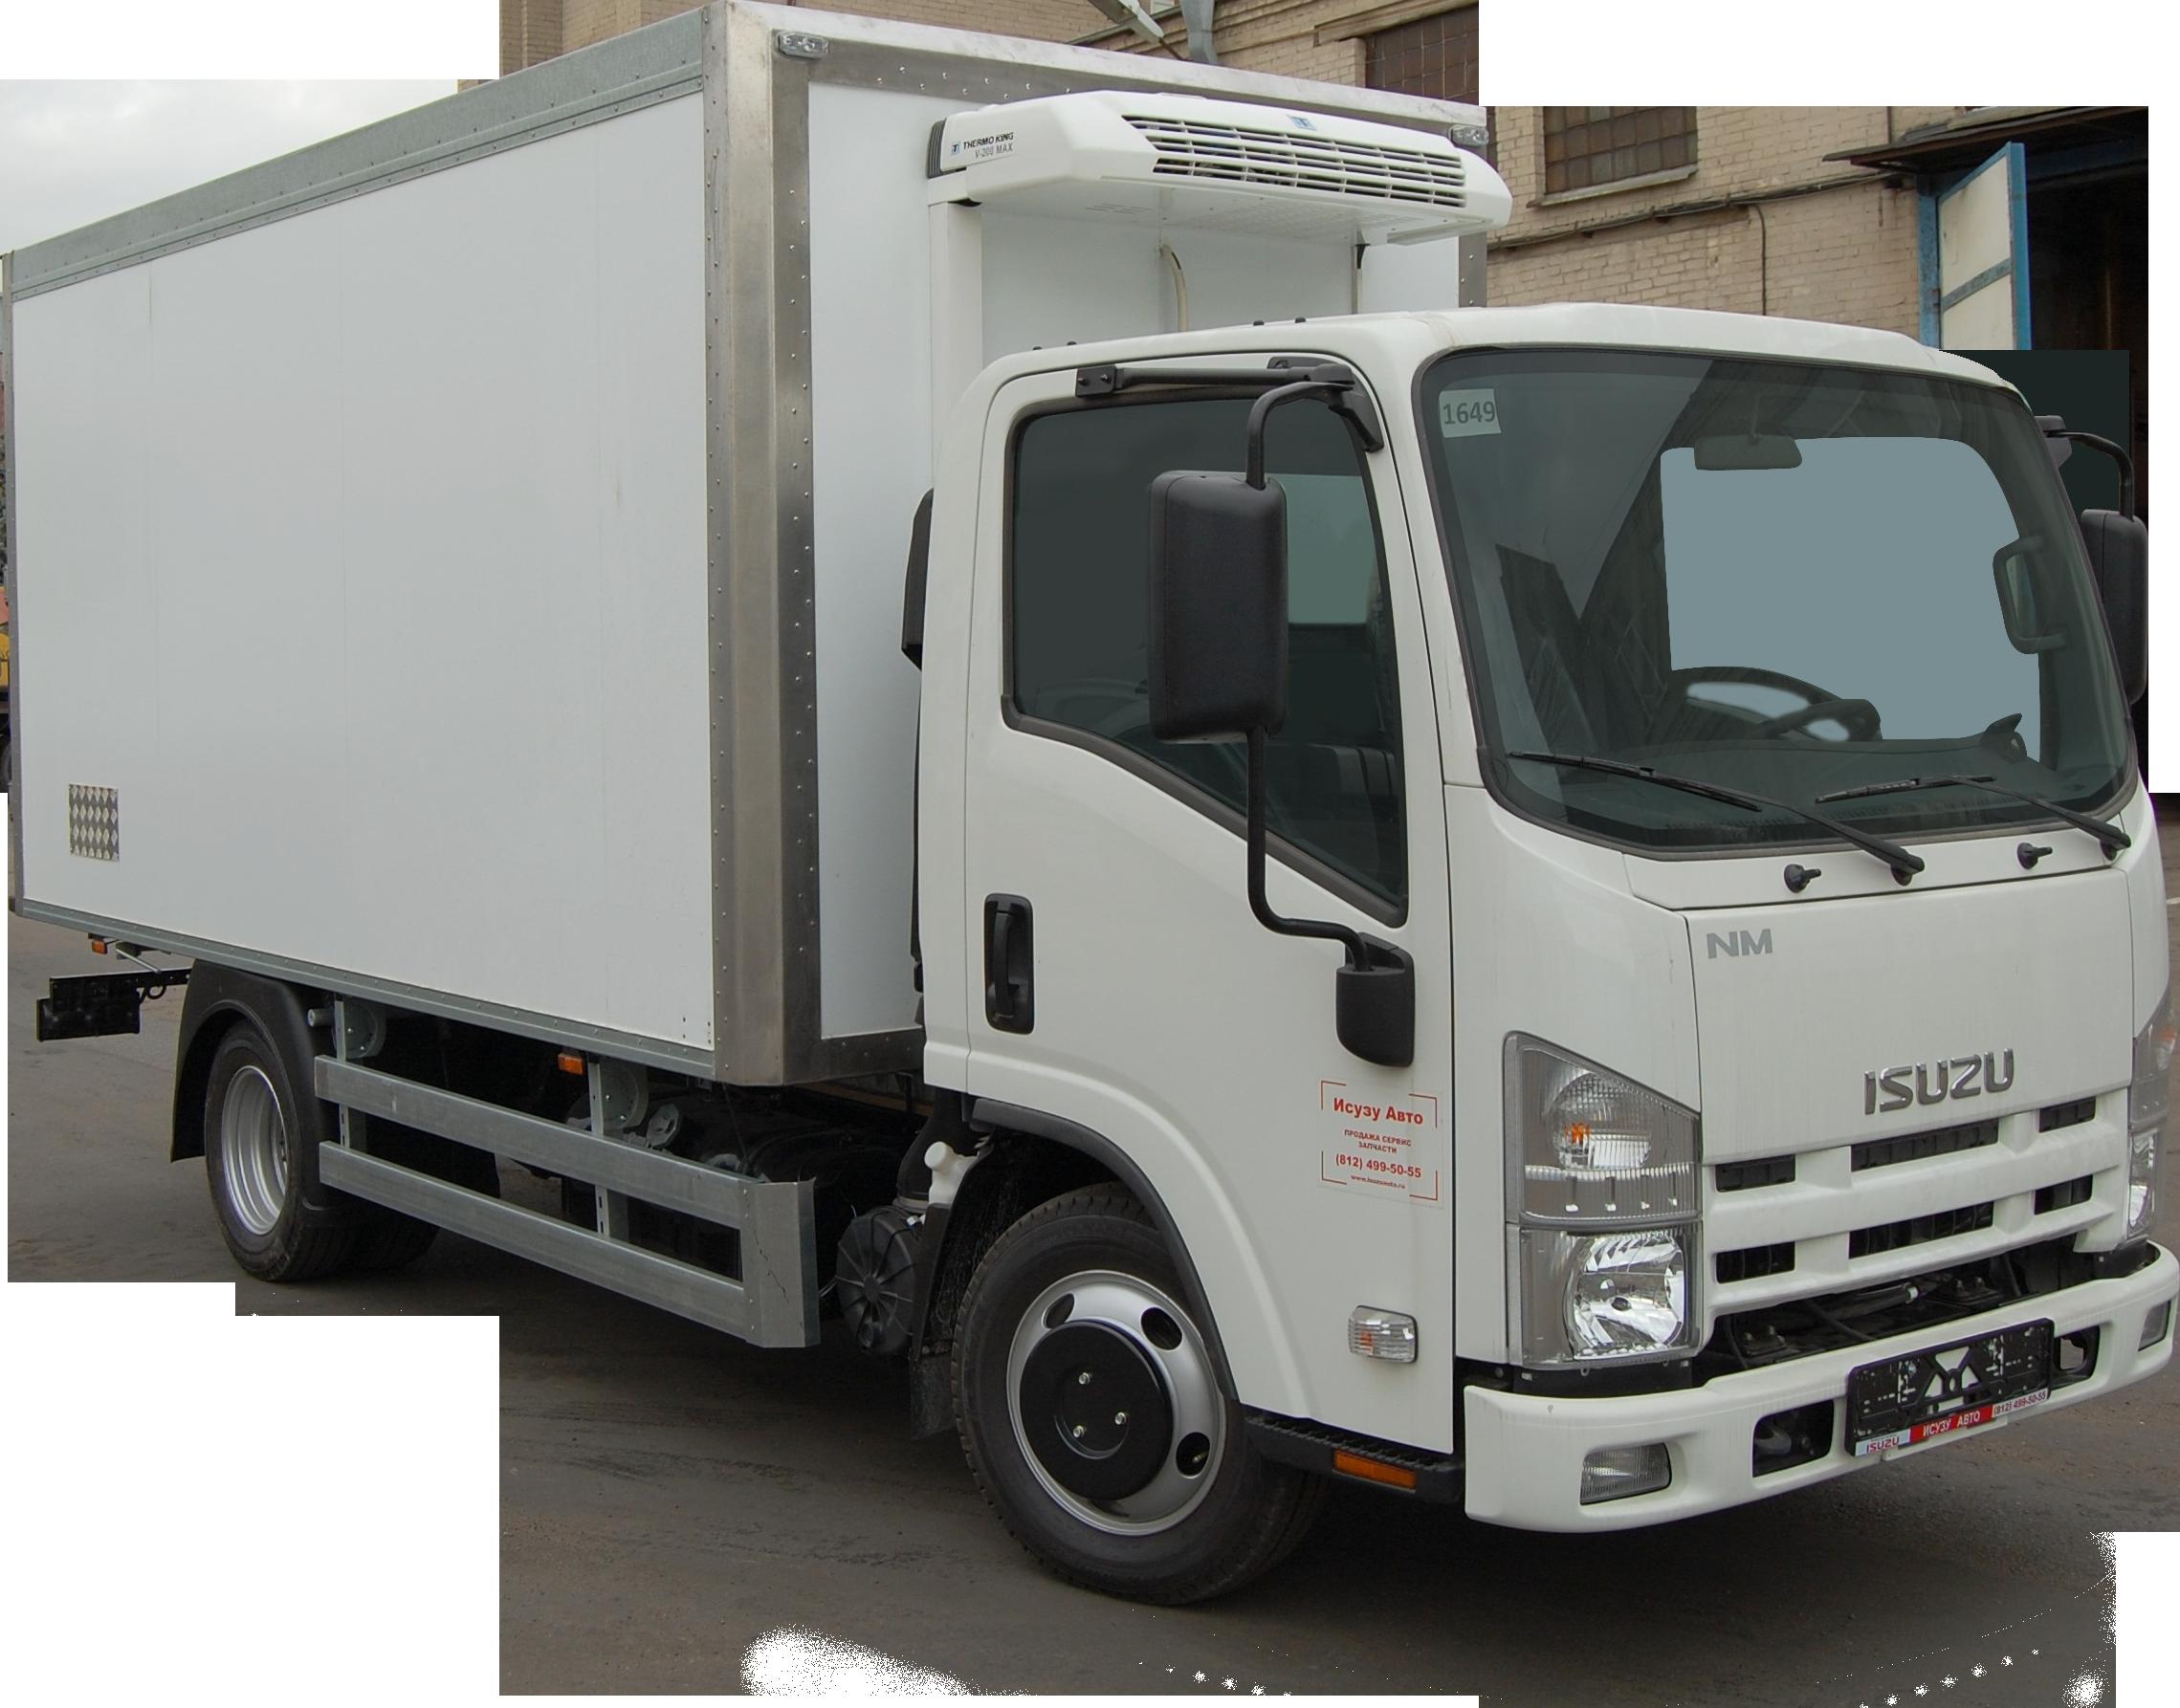 Truck Png Image Purepng Free Transparent Cc0 Png Image